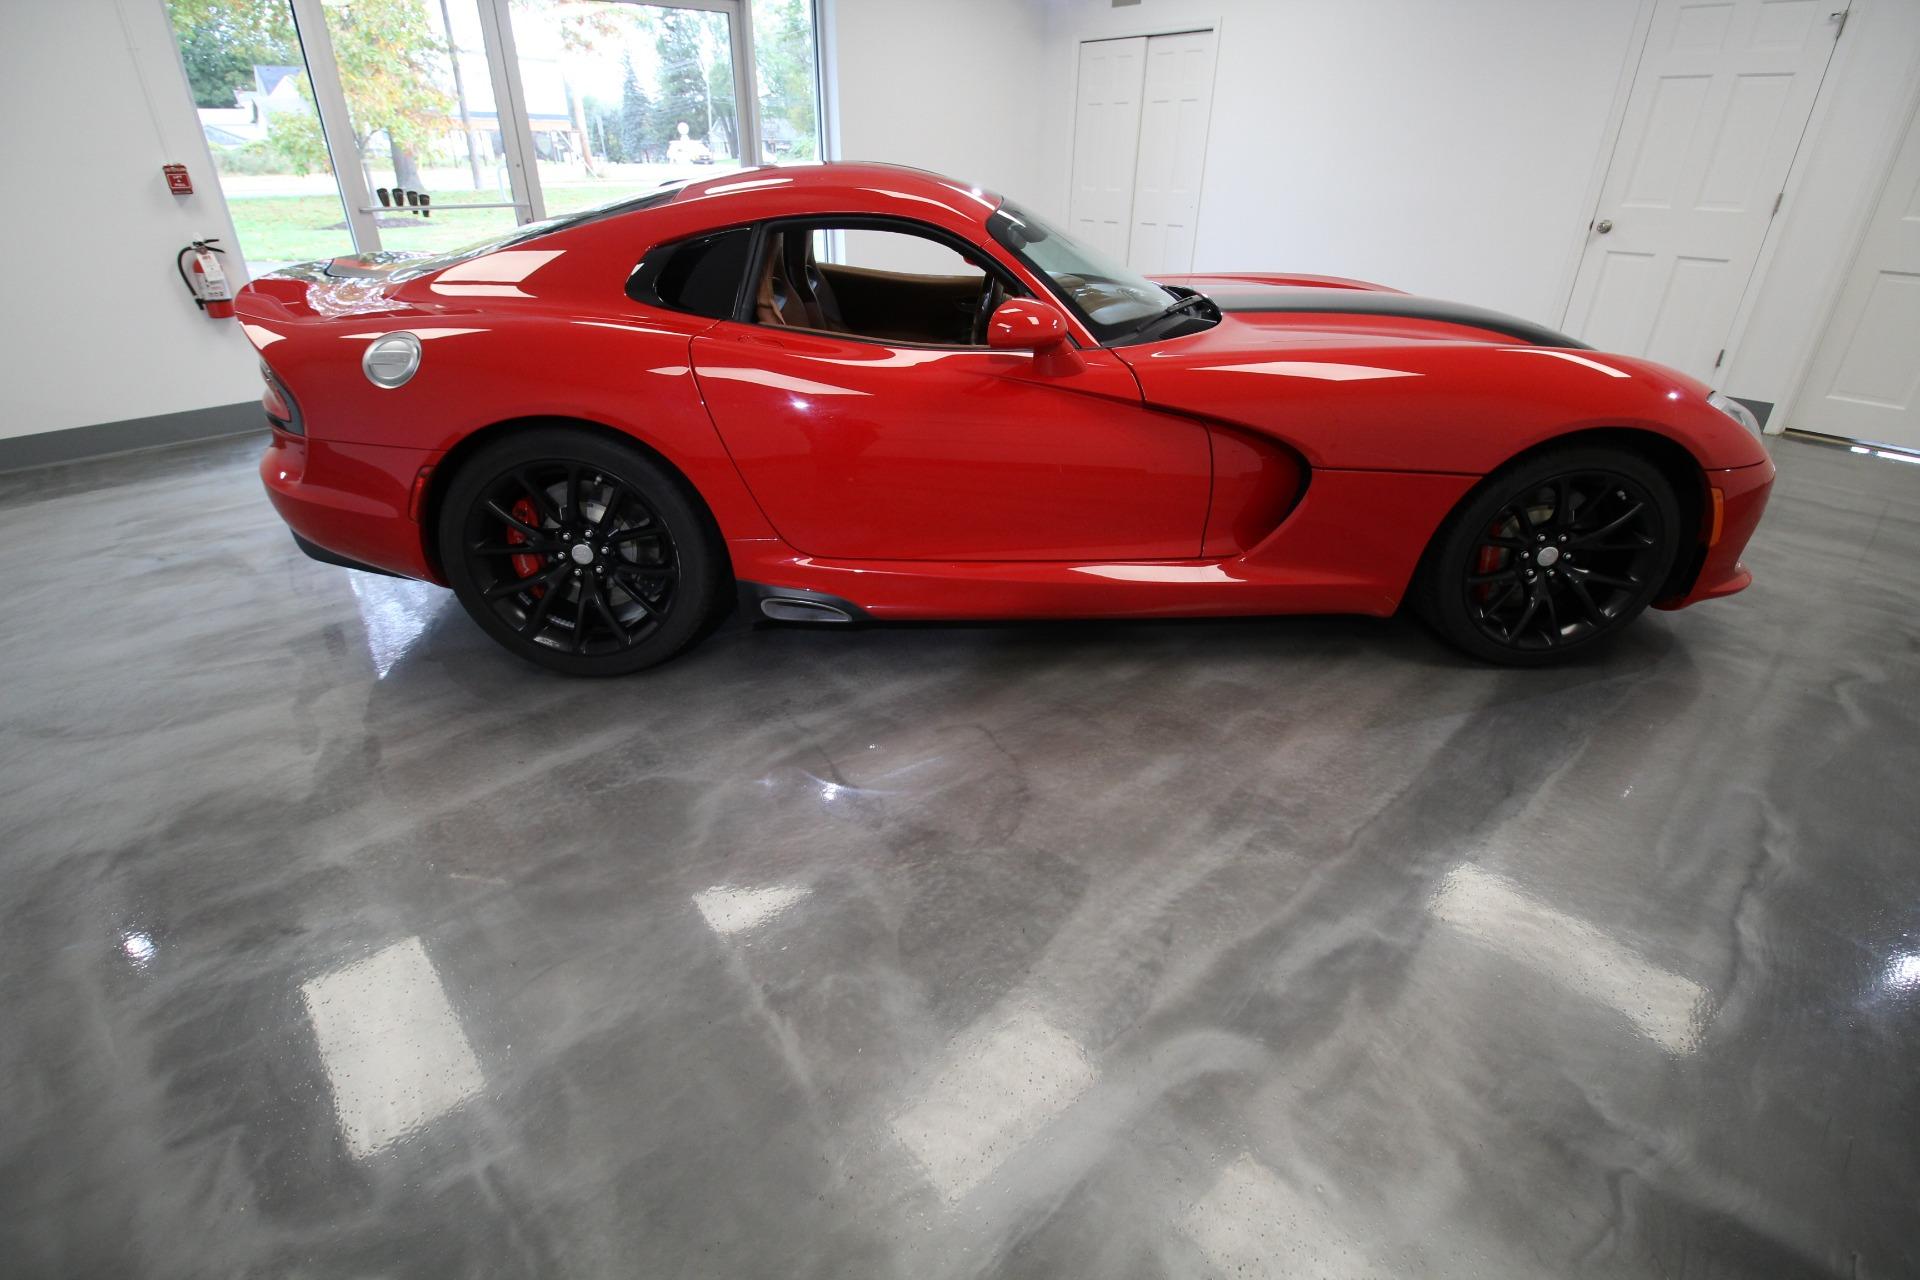 Used 2015 Dodge Viper GTS LIKE NEW LOADED MSRP NEW WAS 121K | Albany, NY